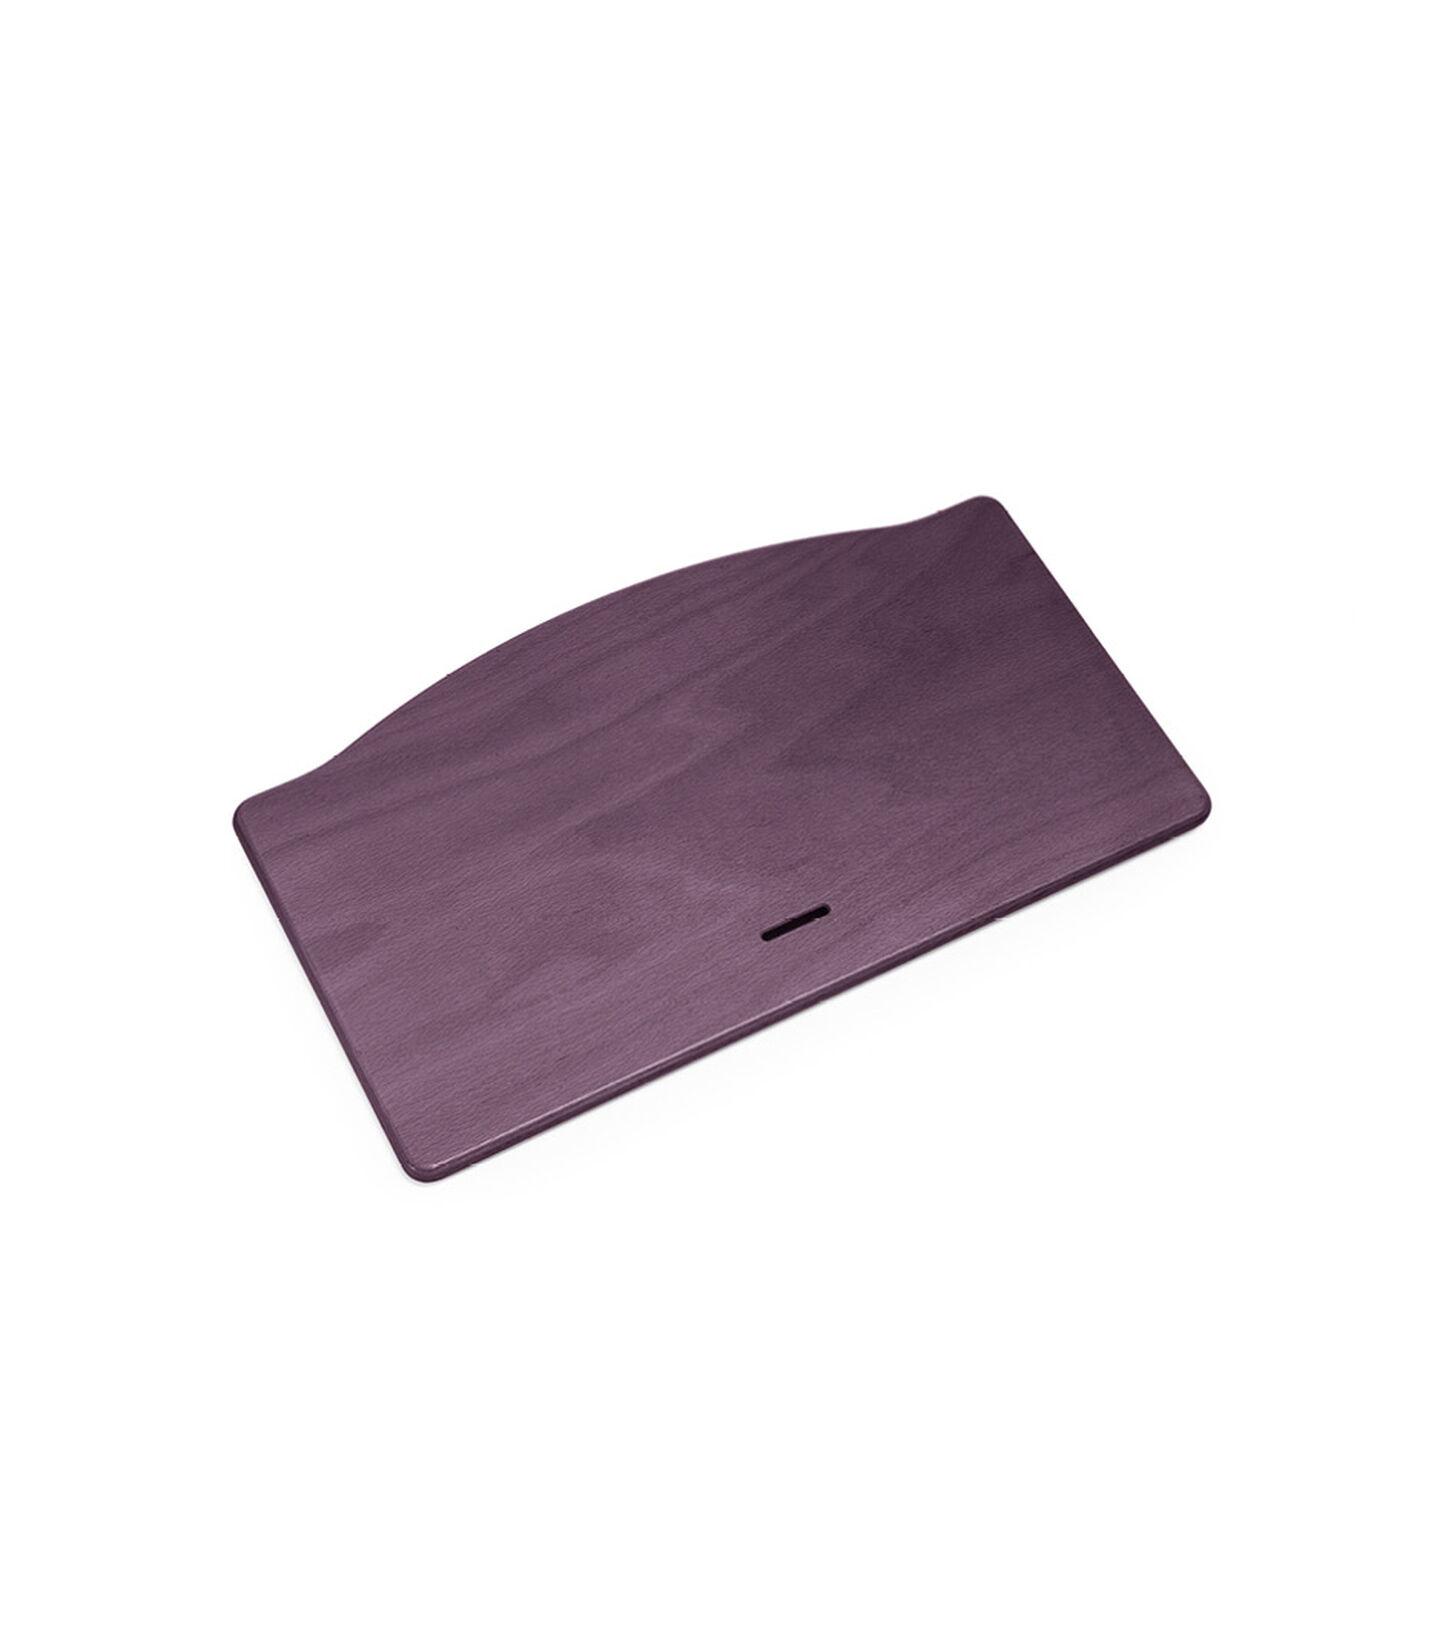 Tripp Trapp® Seatplate Plum Purple, Plum Purple, mainview view 1